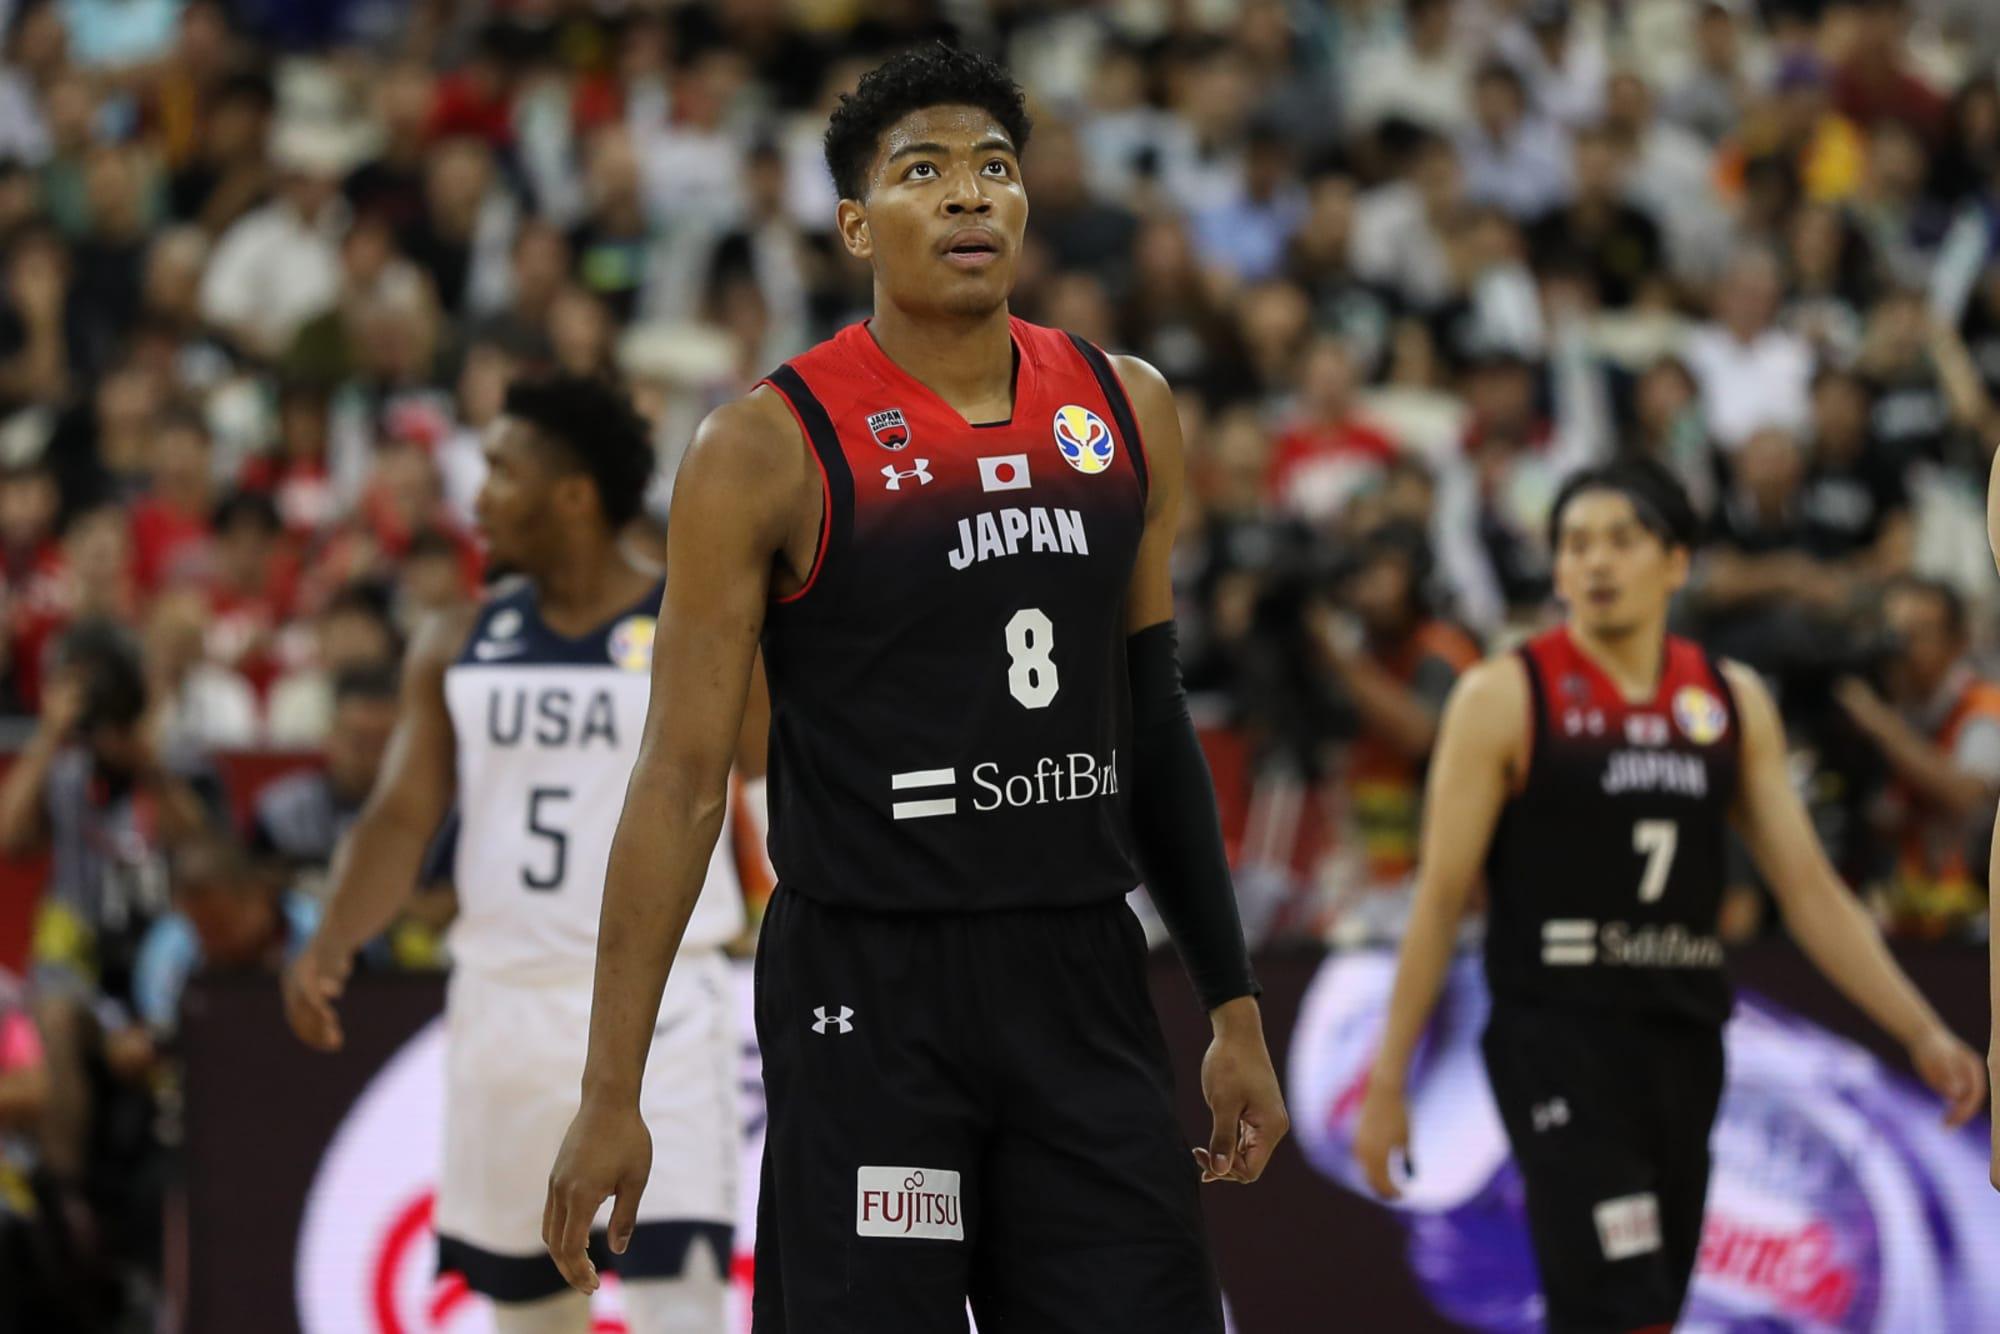 Rui Hachimura and Japan no match for Team USA